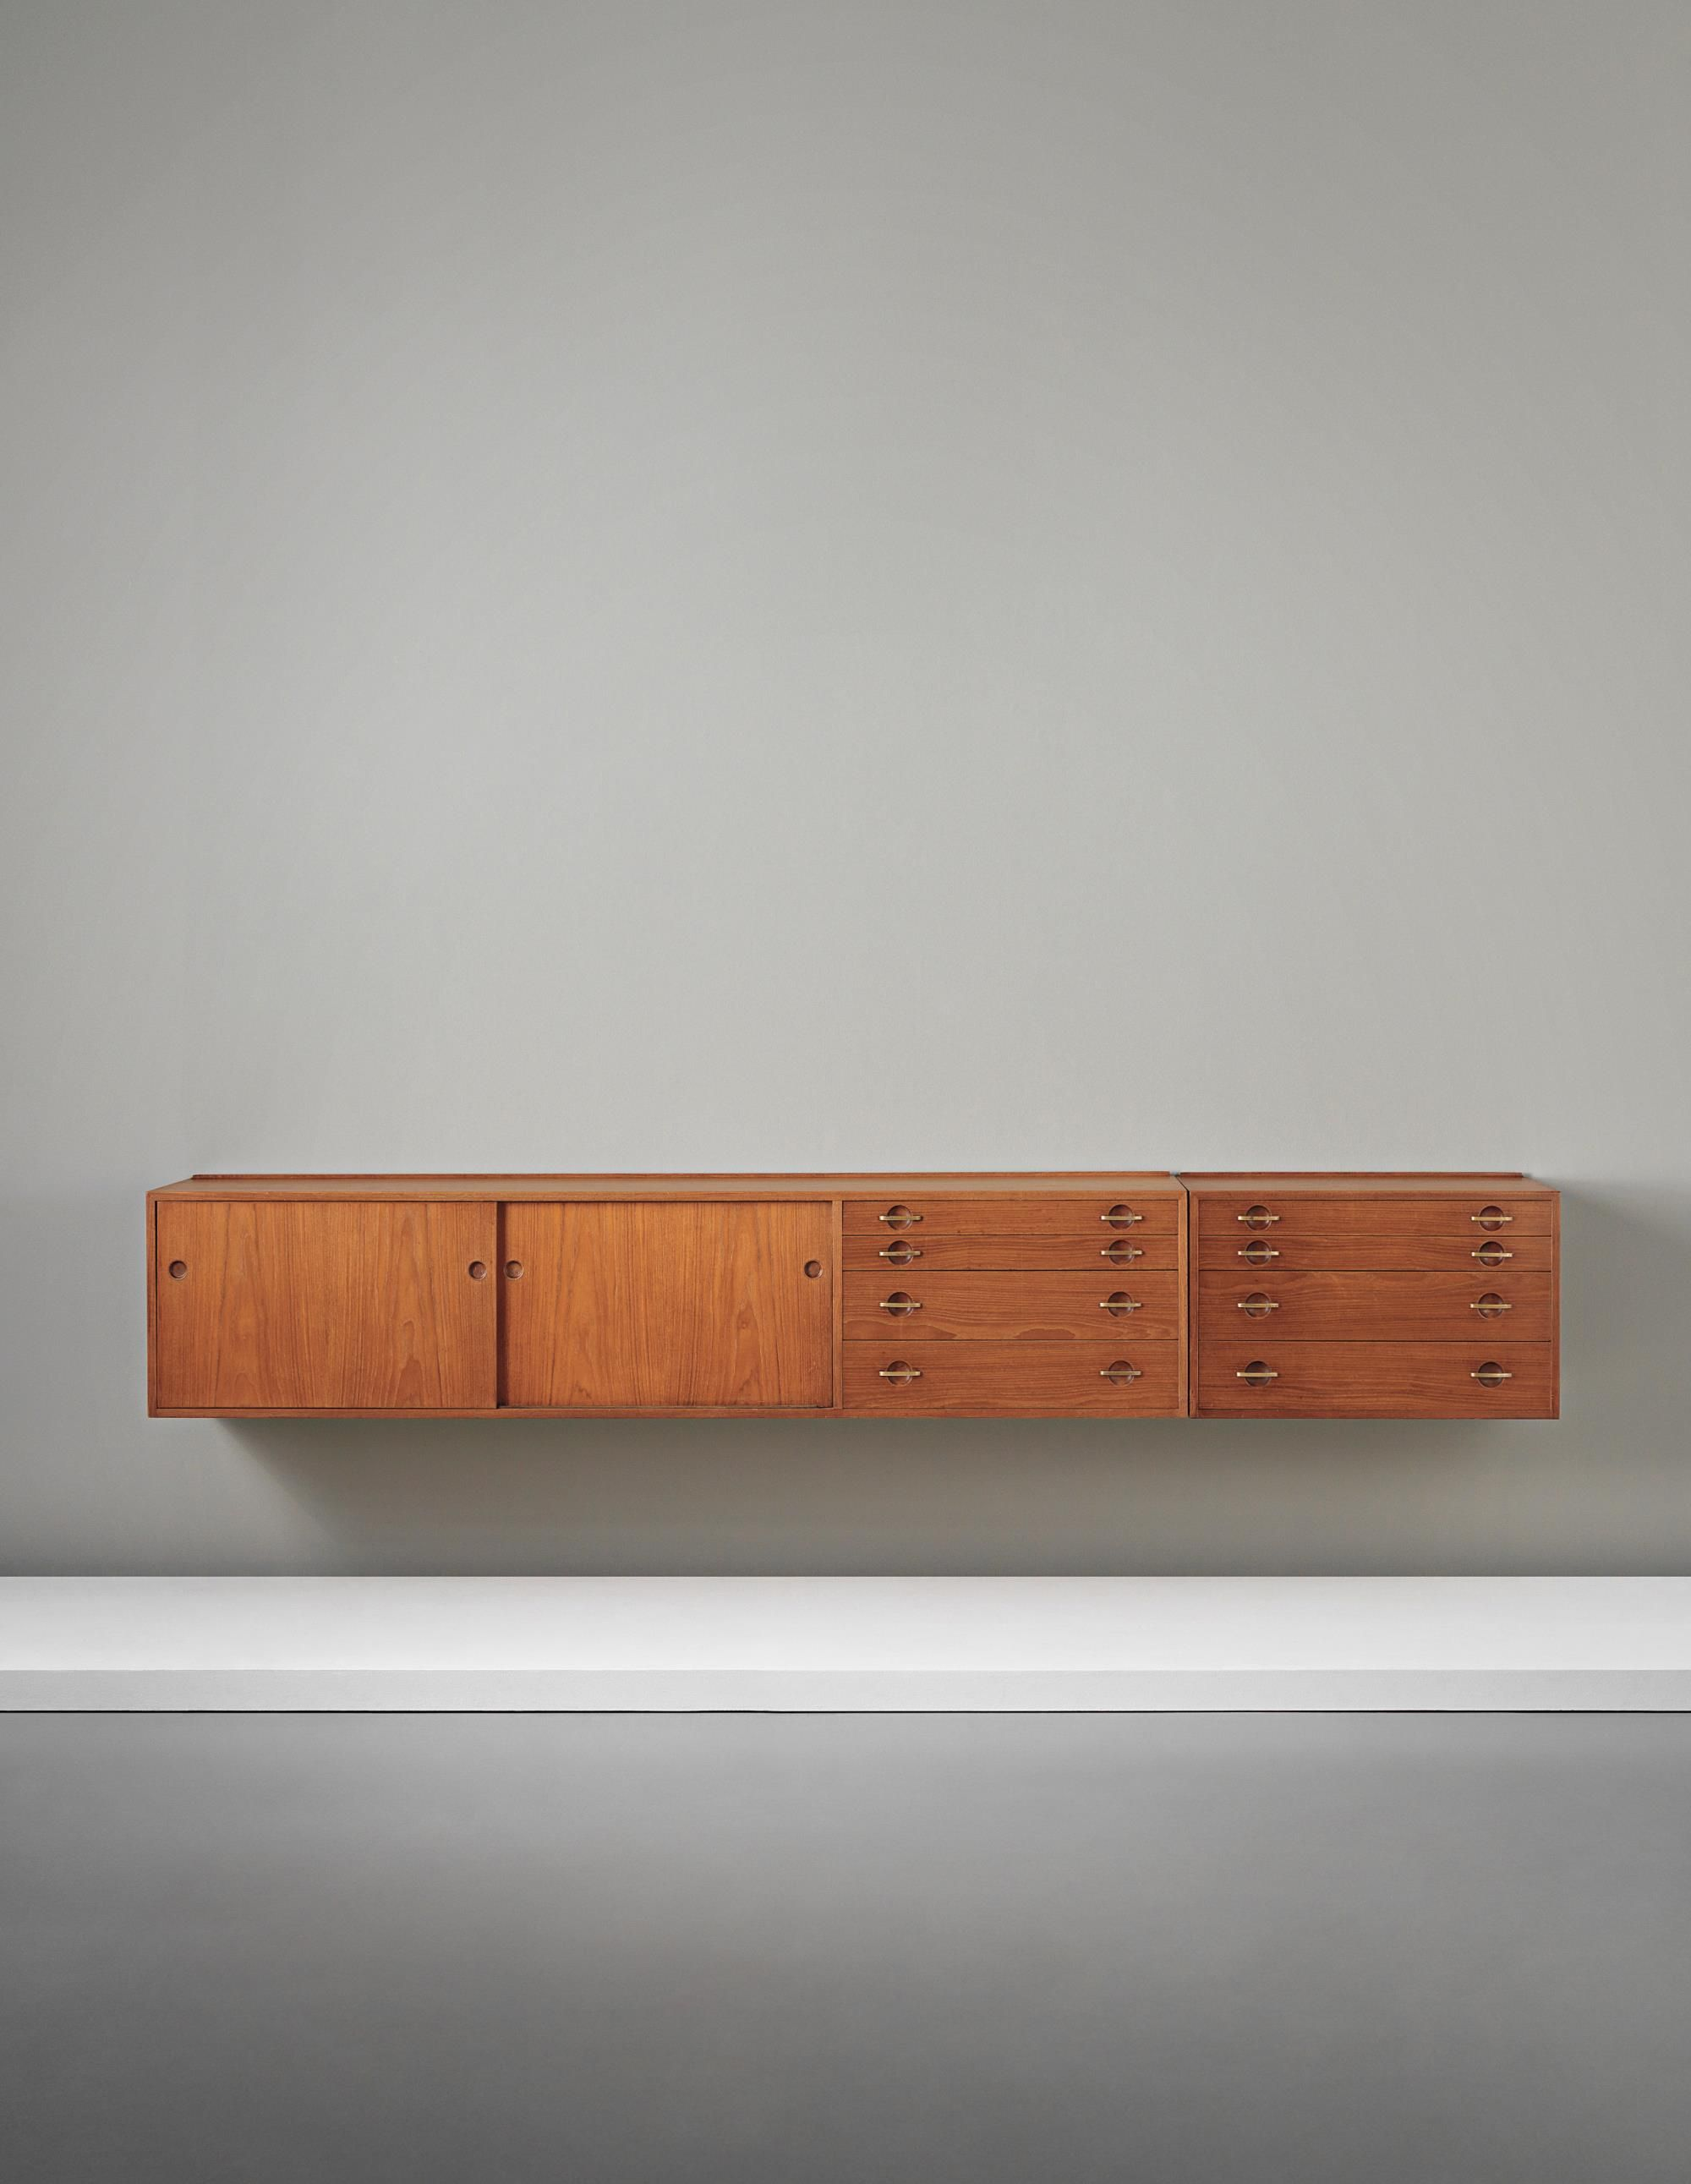 Hans J. Wegner; Teak, Oak And Brass Wall Mounted Cabinet For Johannes